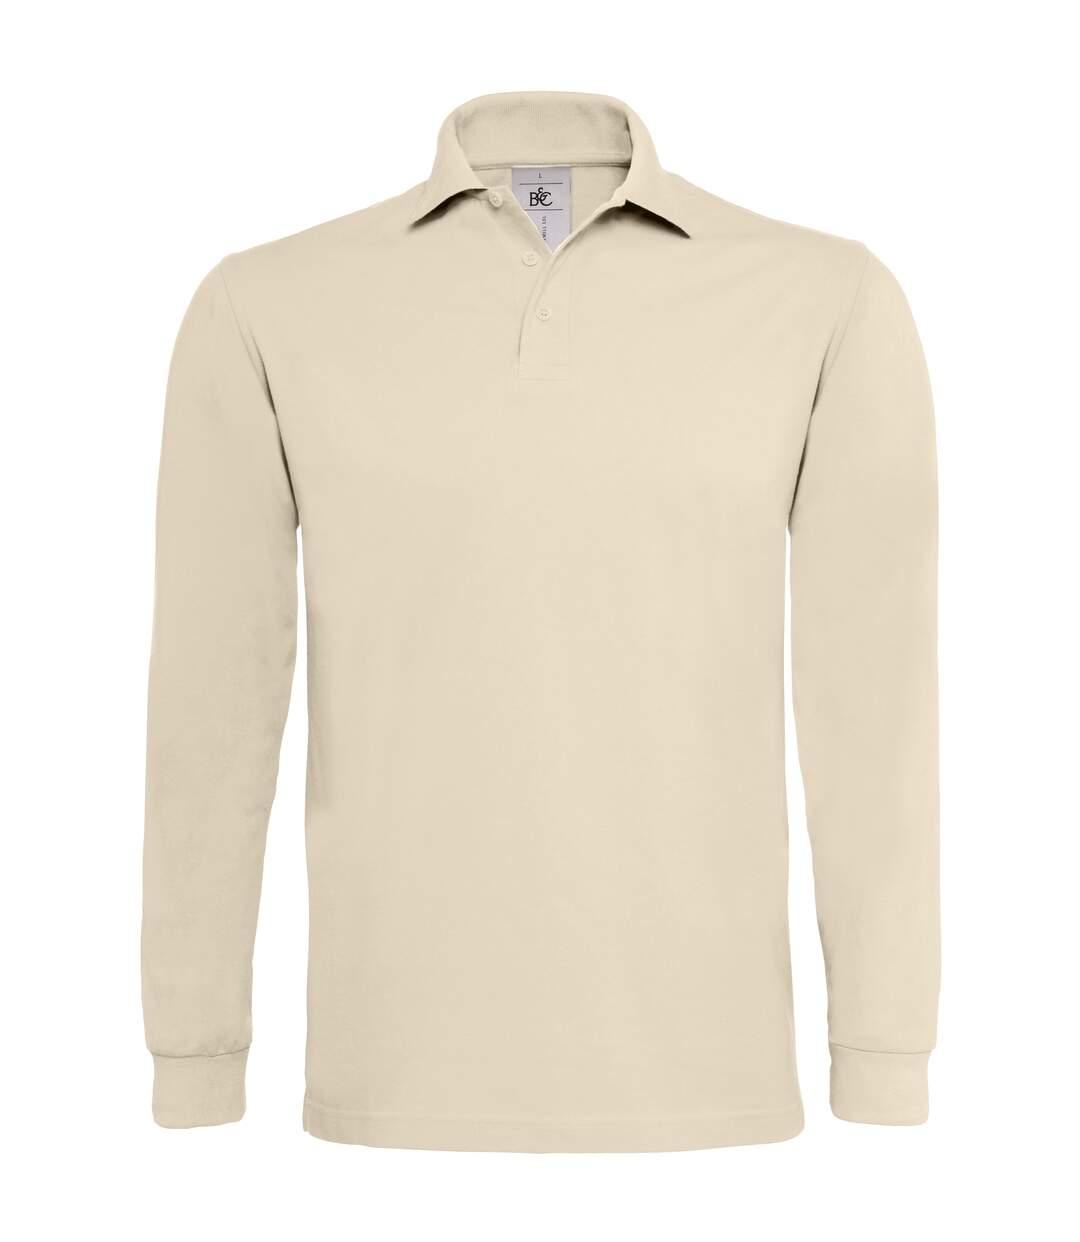 B&C Mens Heavymill Cotton Long Sleeve Polo Shirt (Red) - UTRW3007